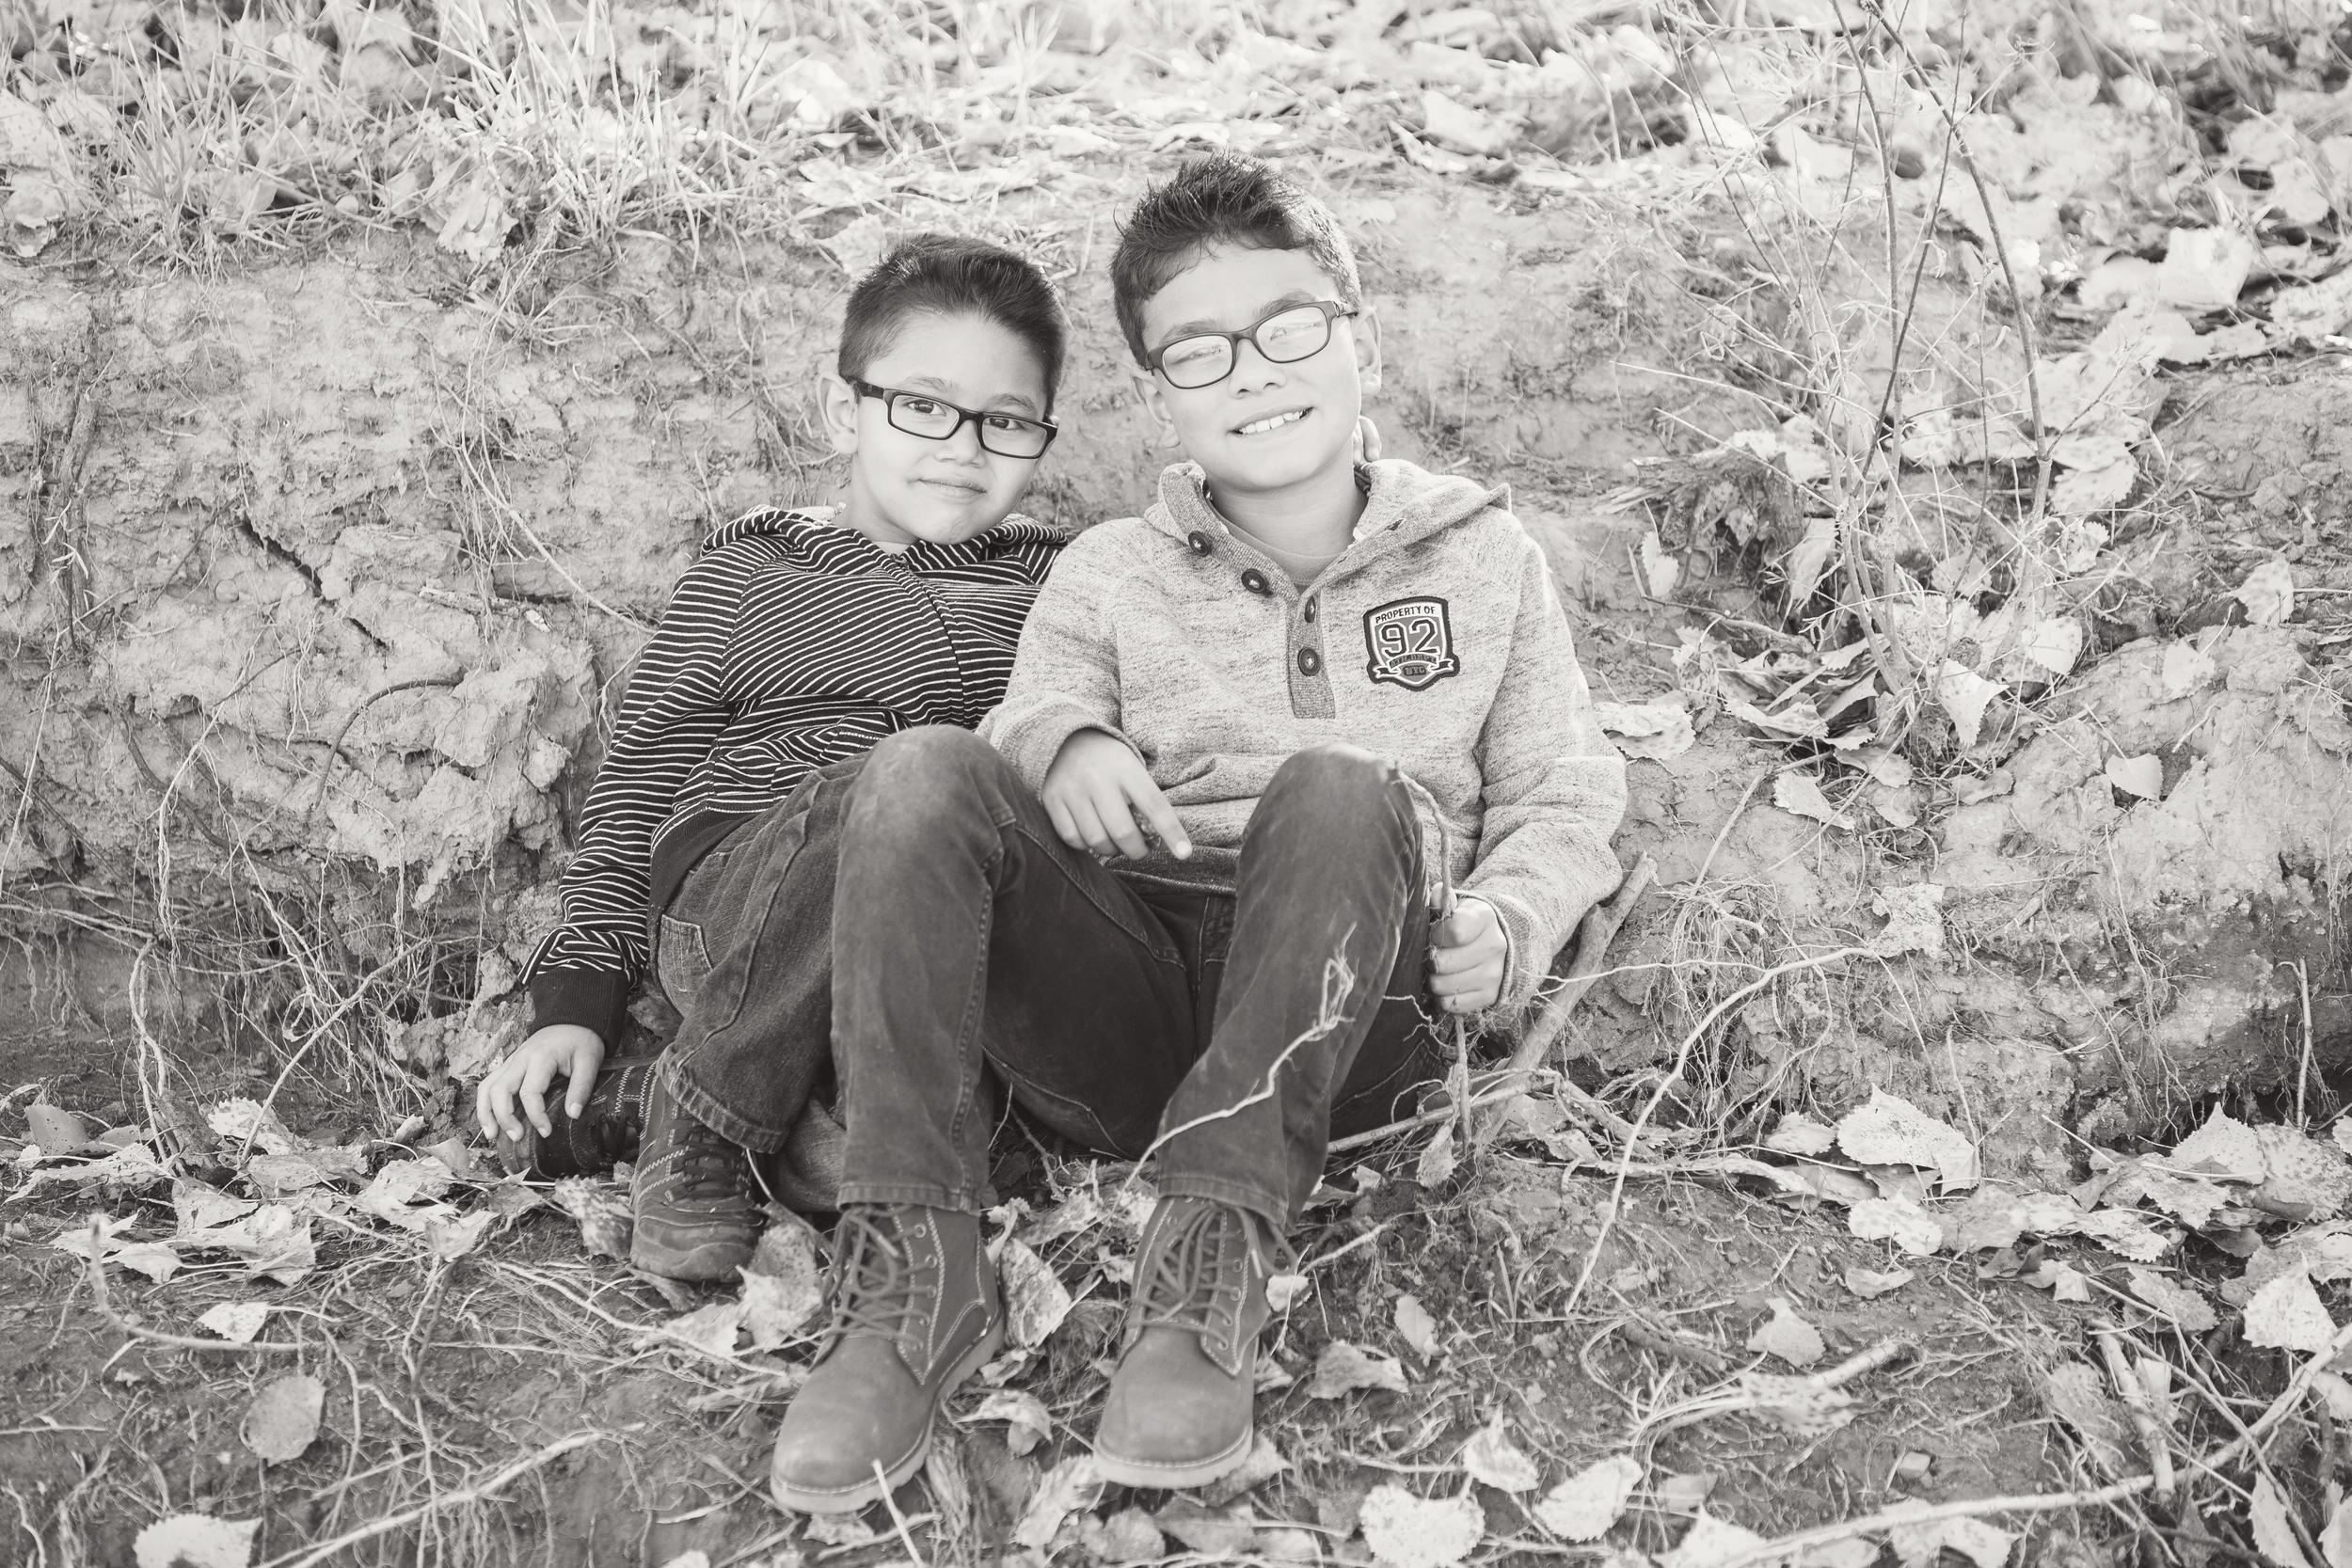 Family_Photos_2014_033_bw.jpg